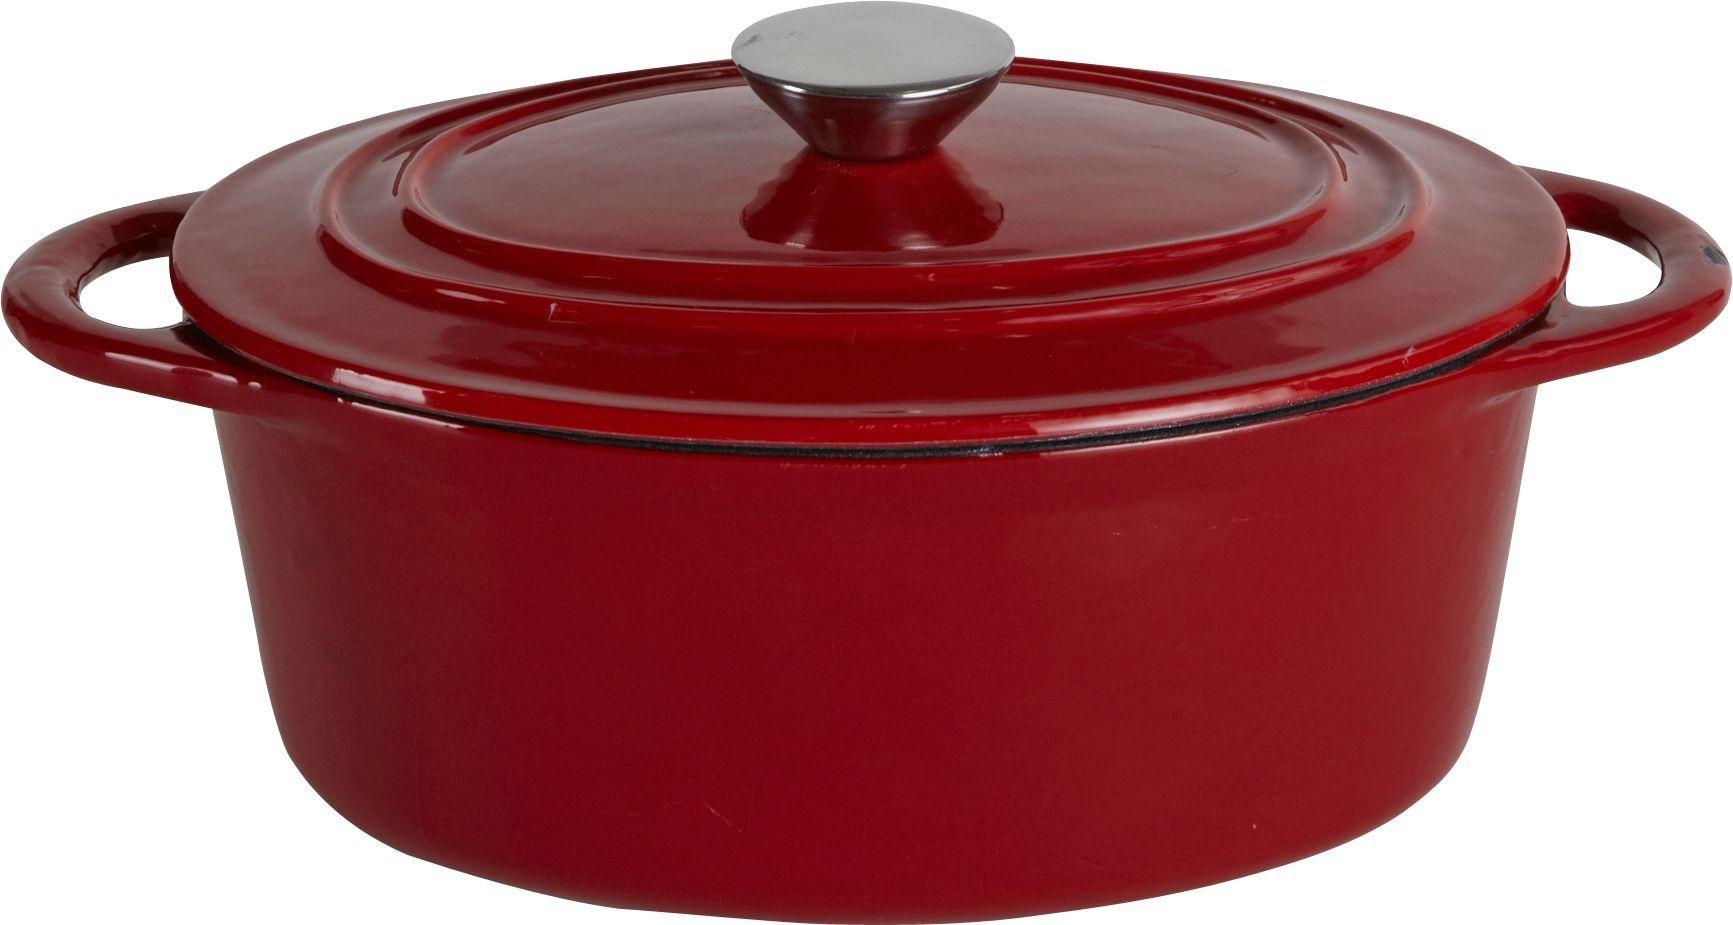 Heart of House - 27cm Cast Iron Oval Casserole Dish